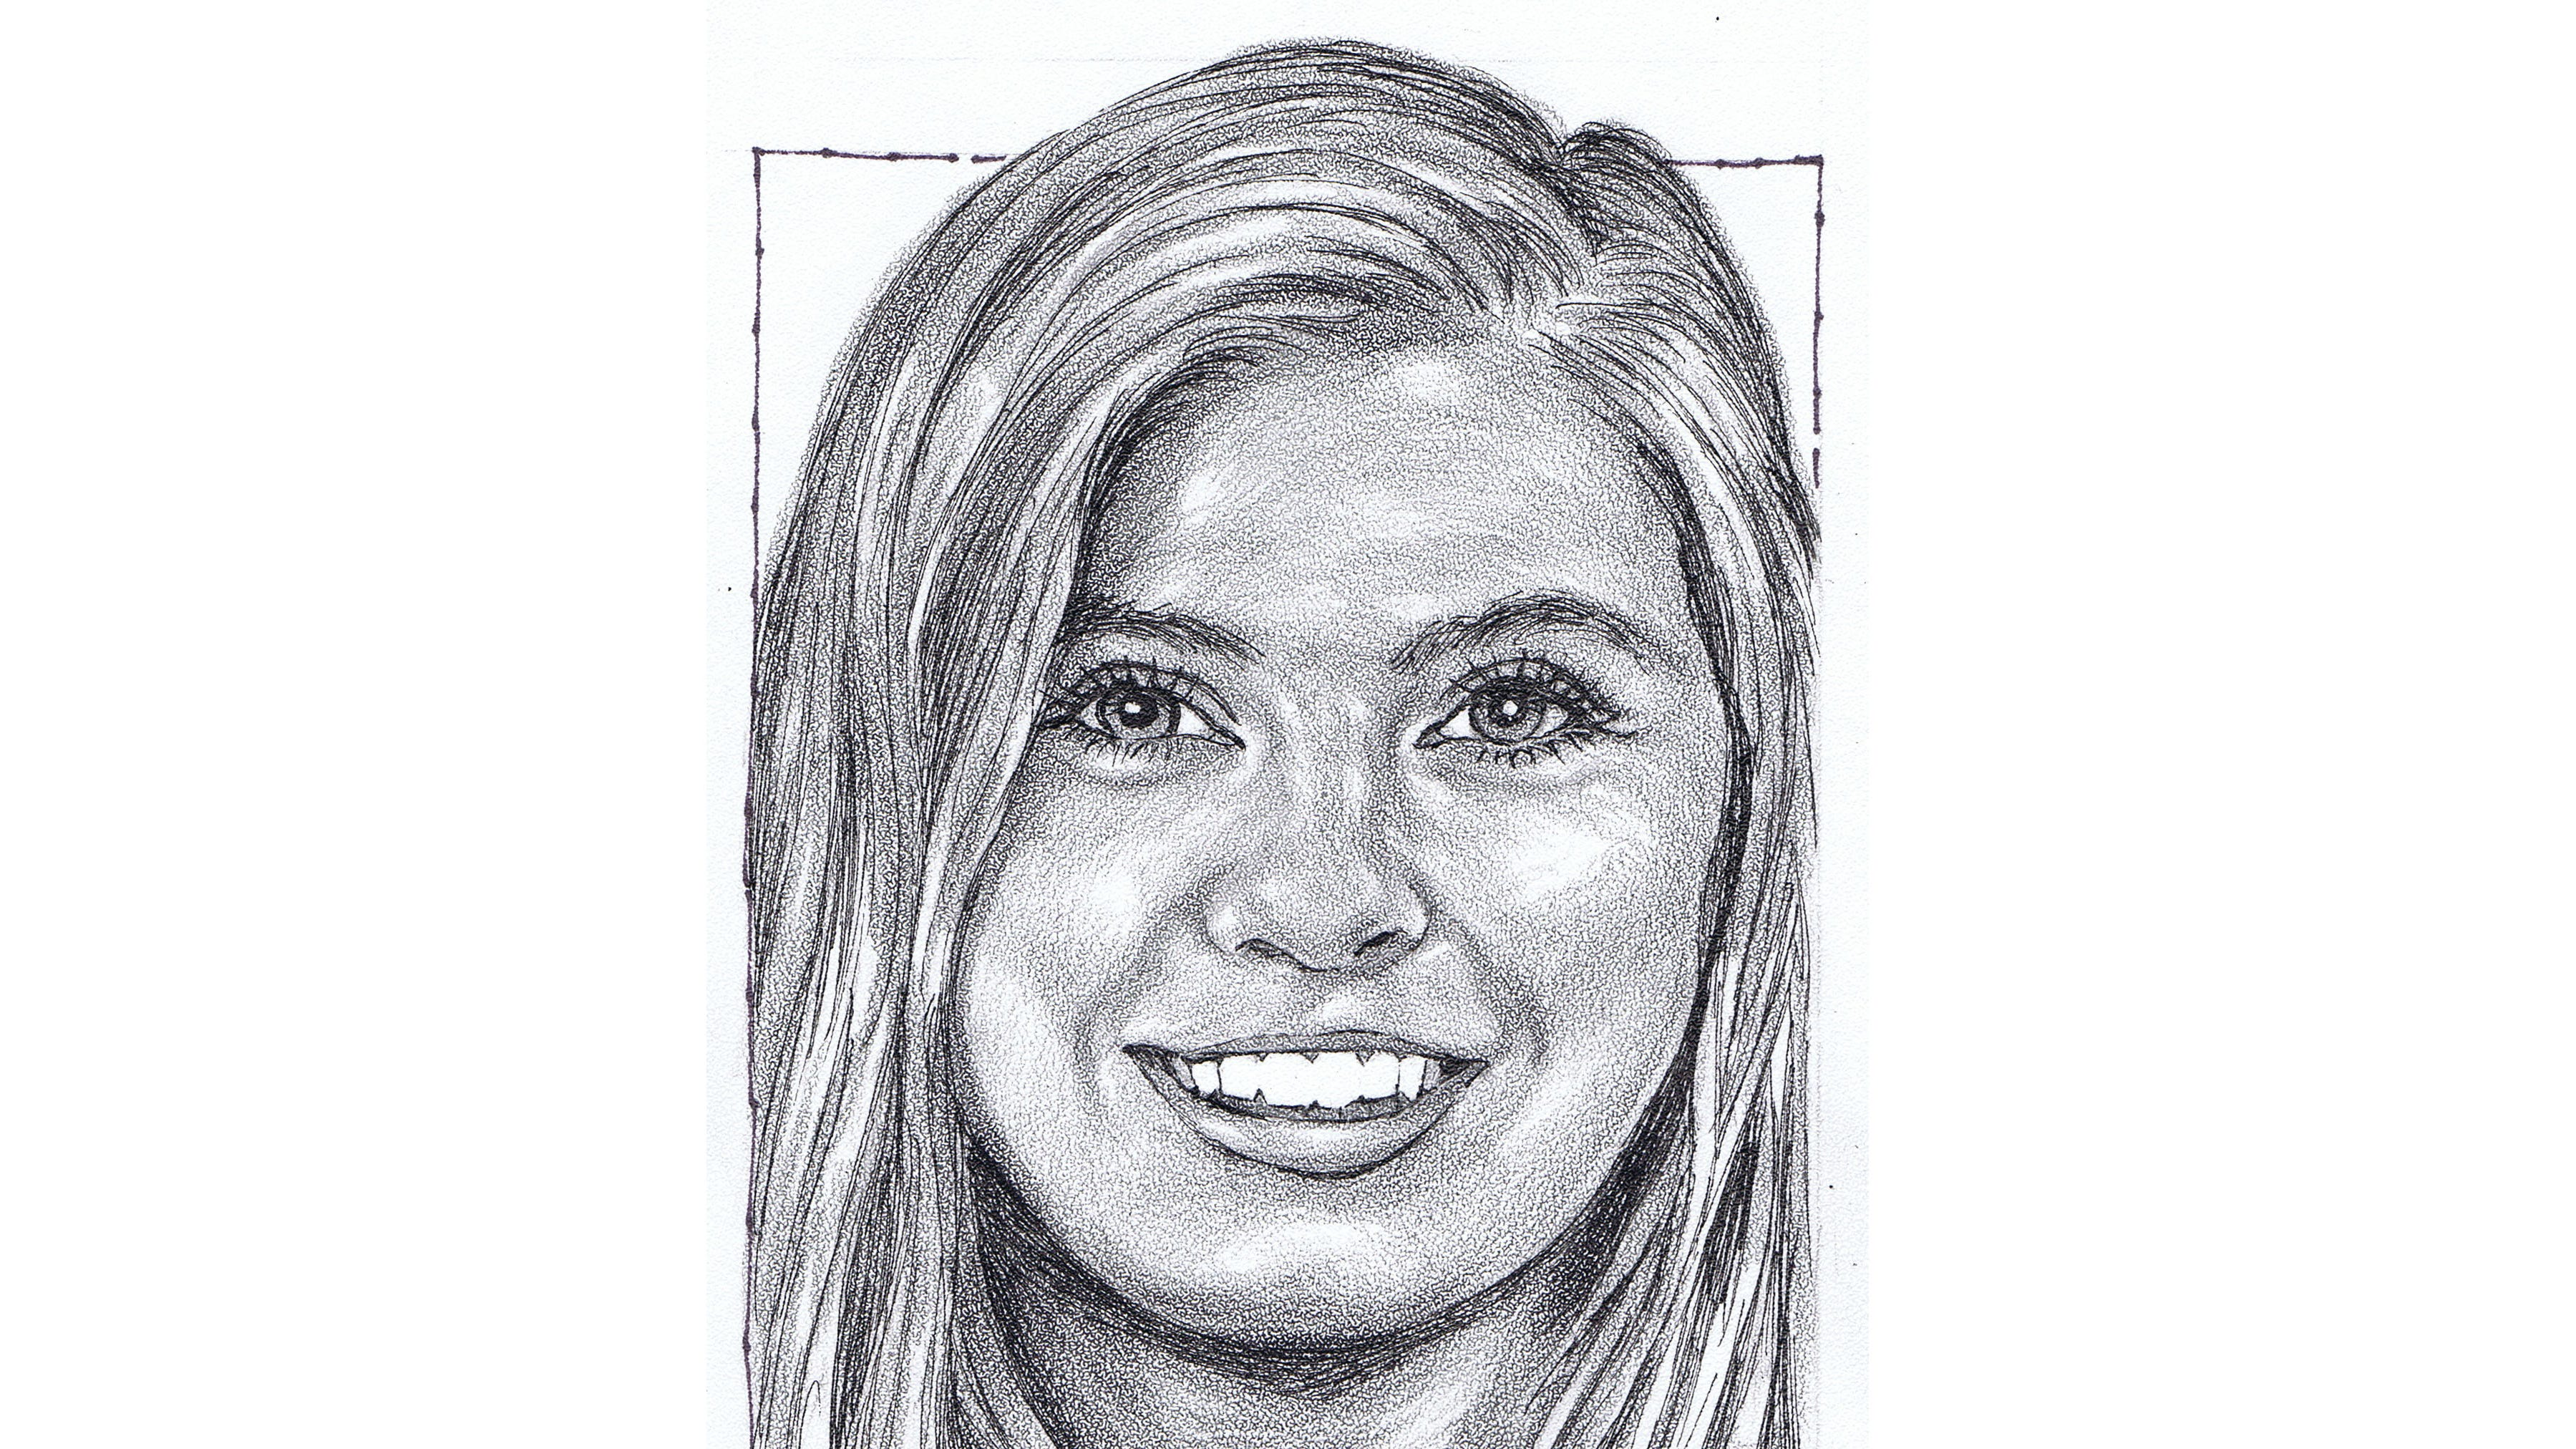 Emma Lein, Midland Park soccer